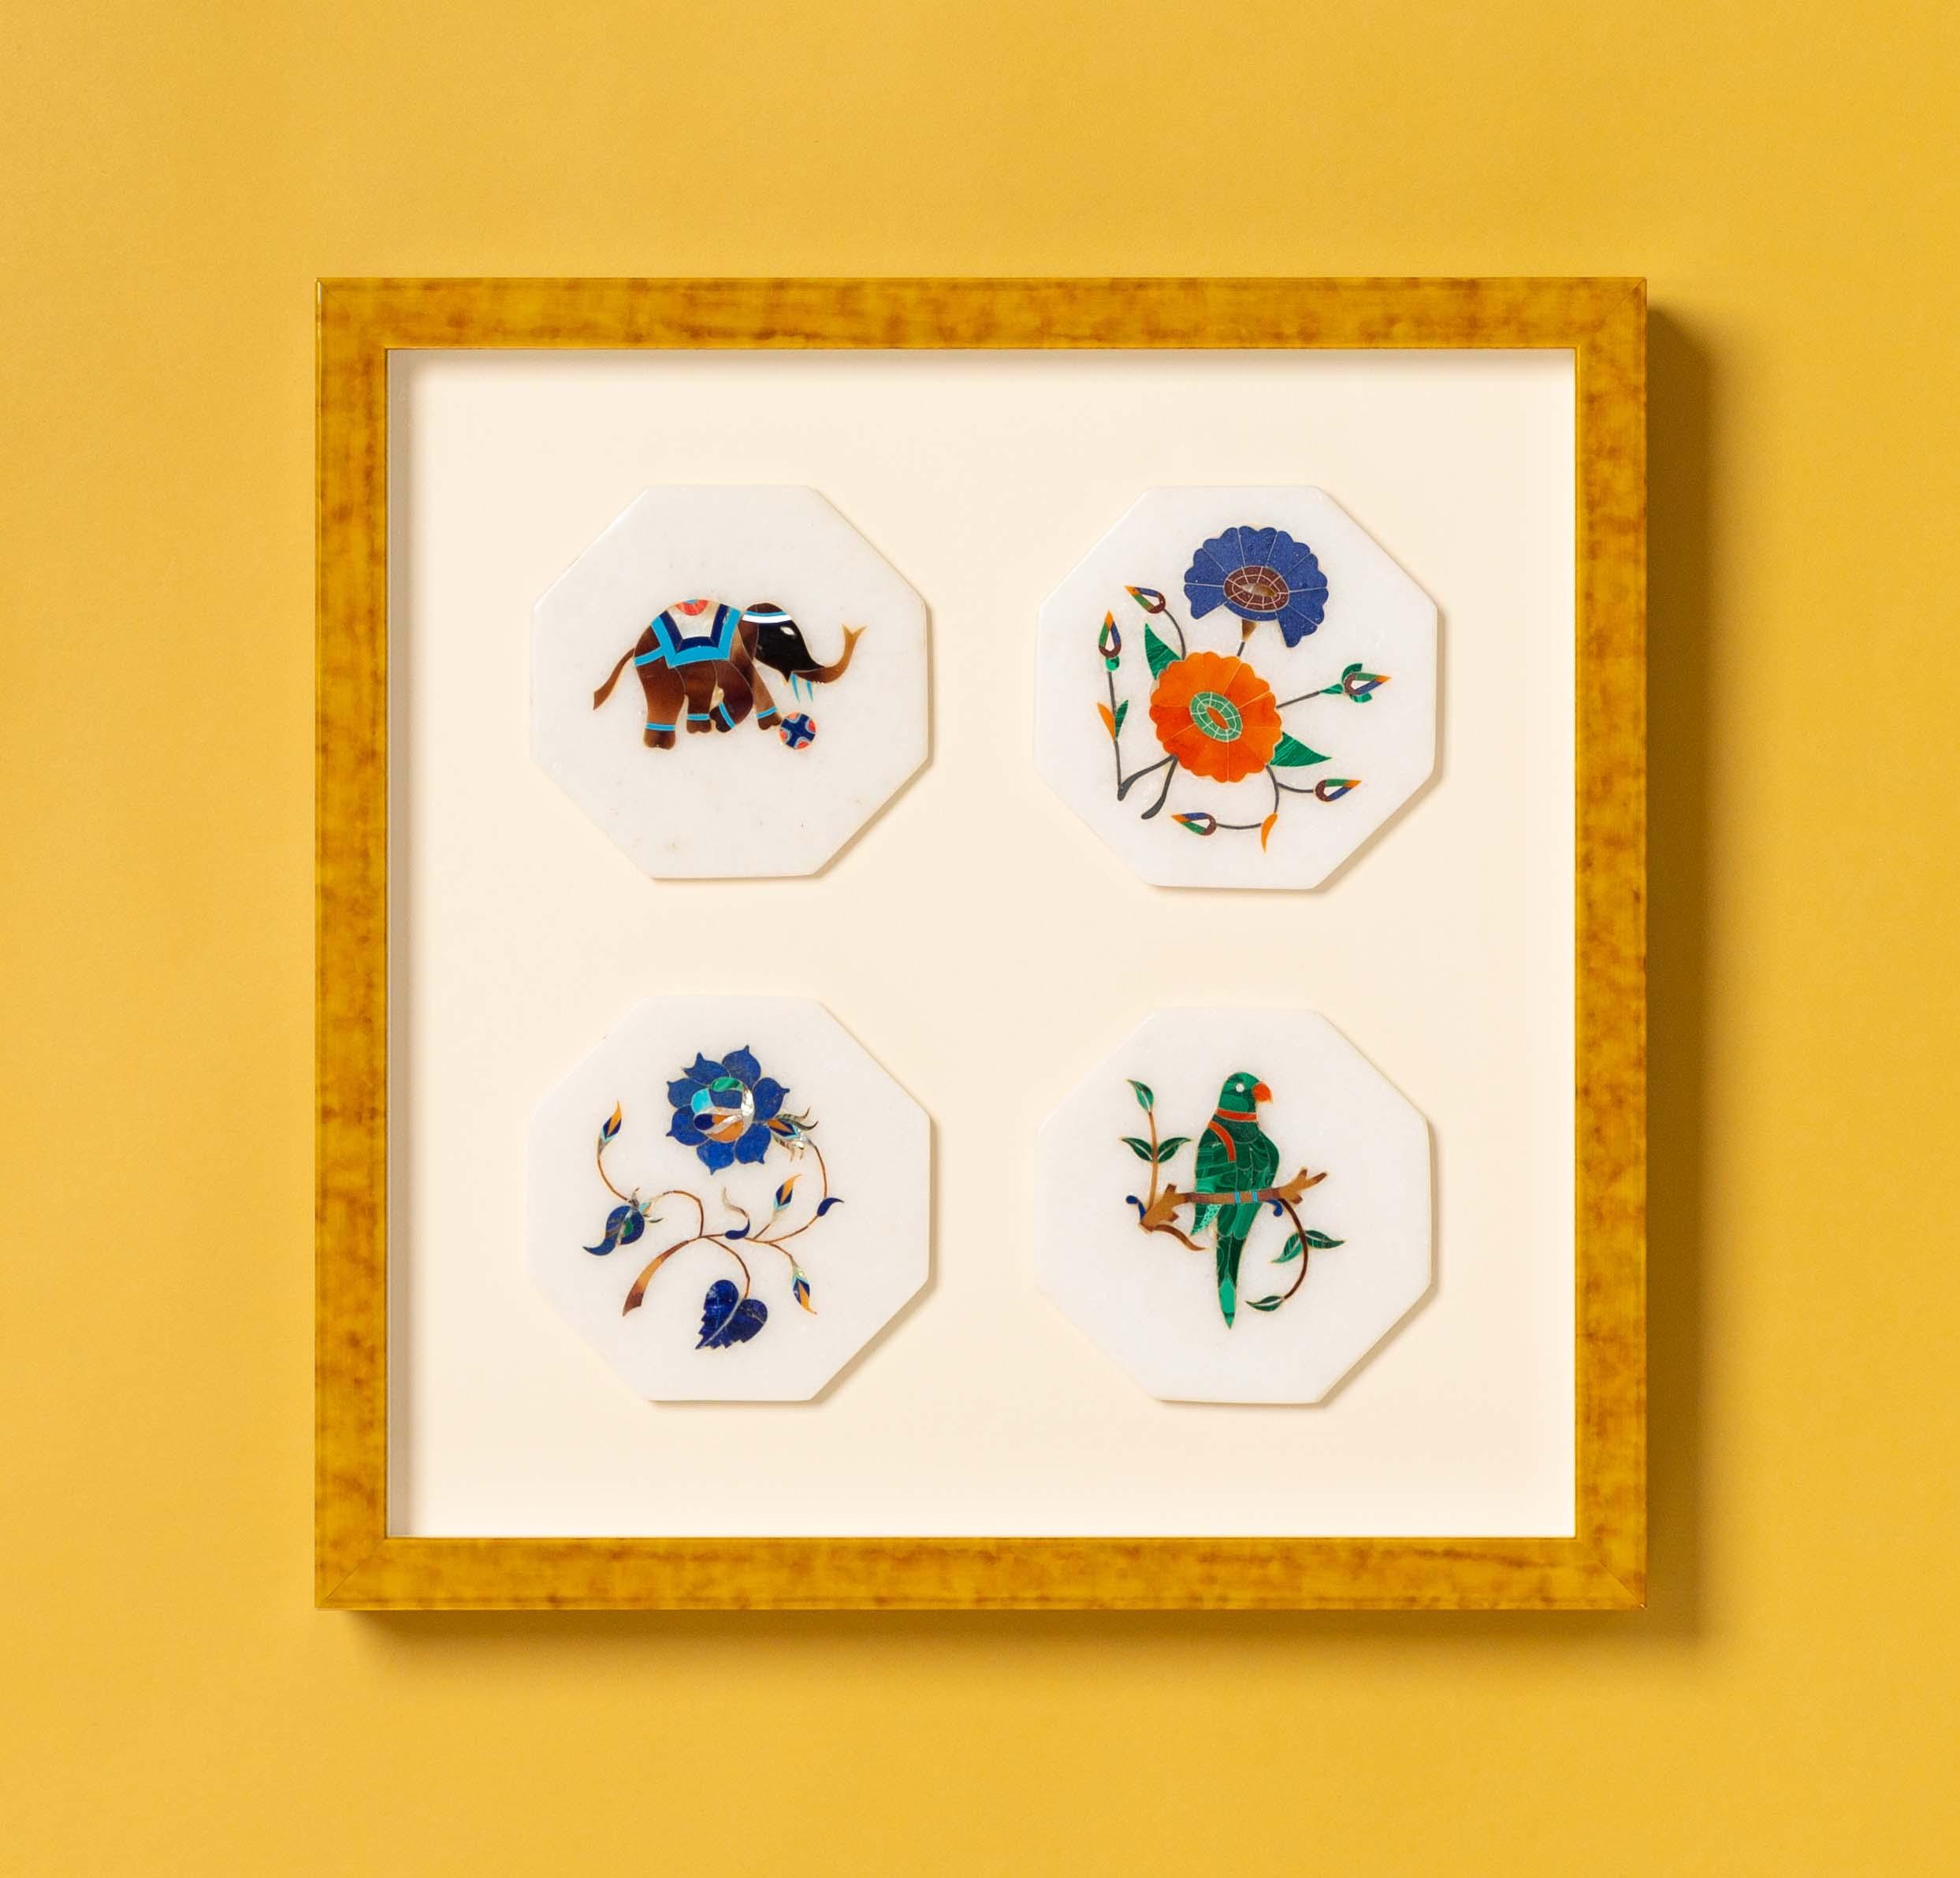 framed Indian art